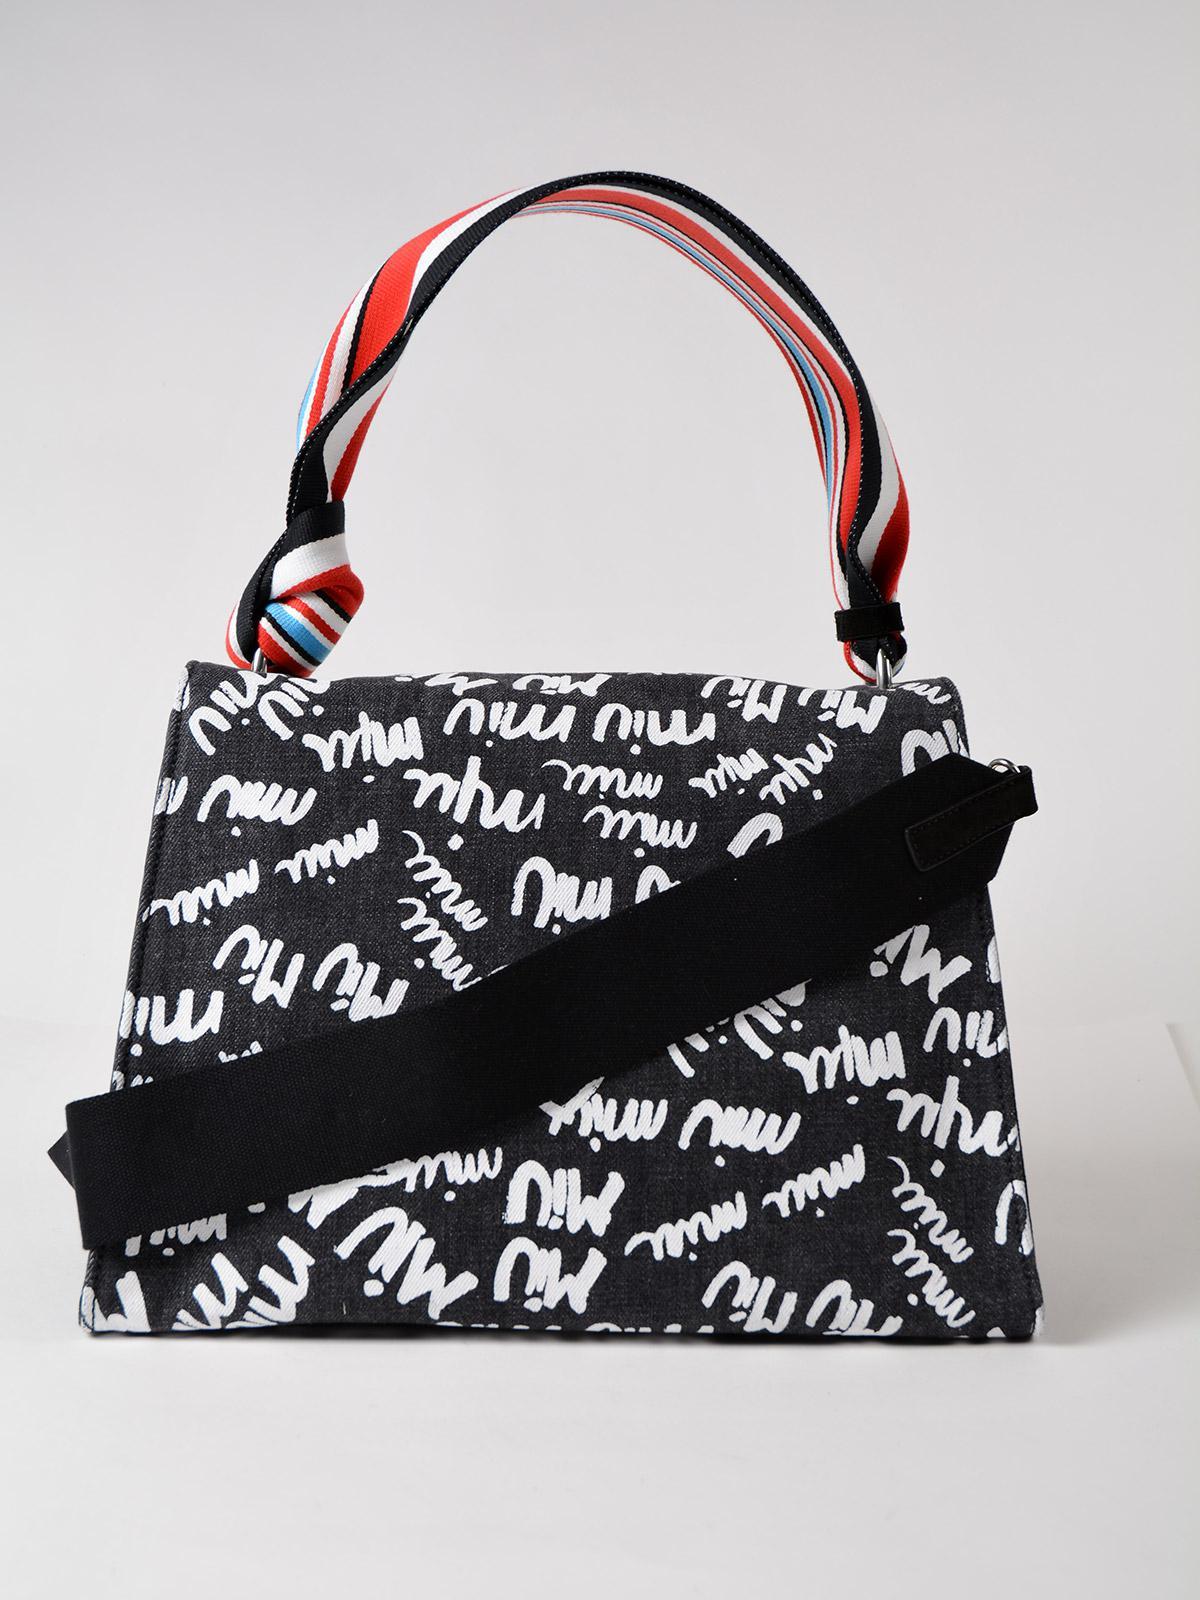 Lyst - Miu Miu Denim Logo Handbag in Black 23013f718447a